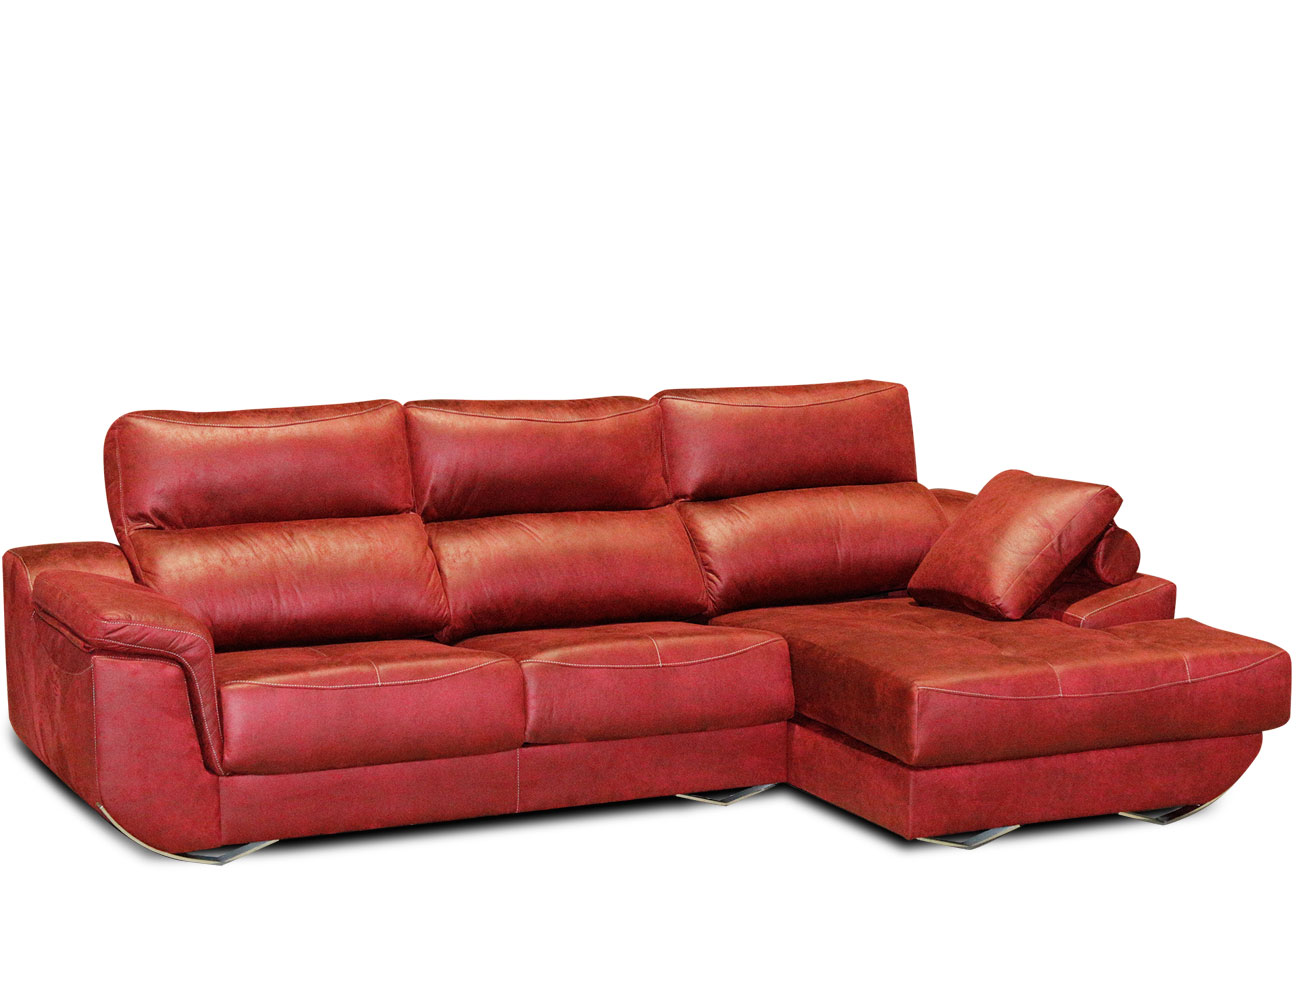 Sofa chaiselongue moderno tejido anti manchas rojo